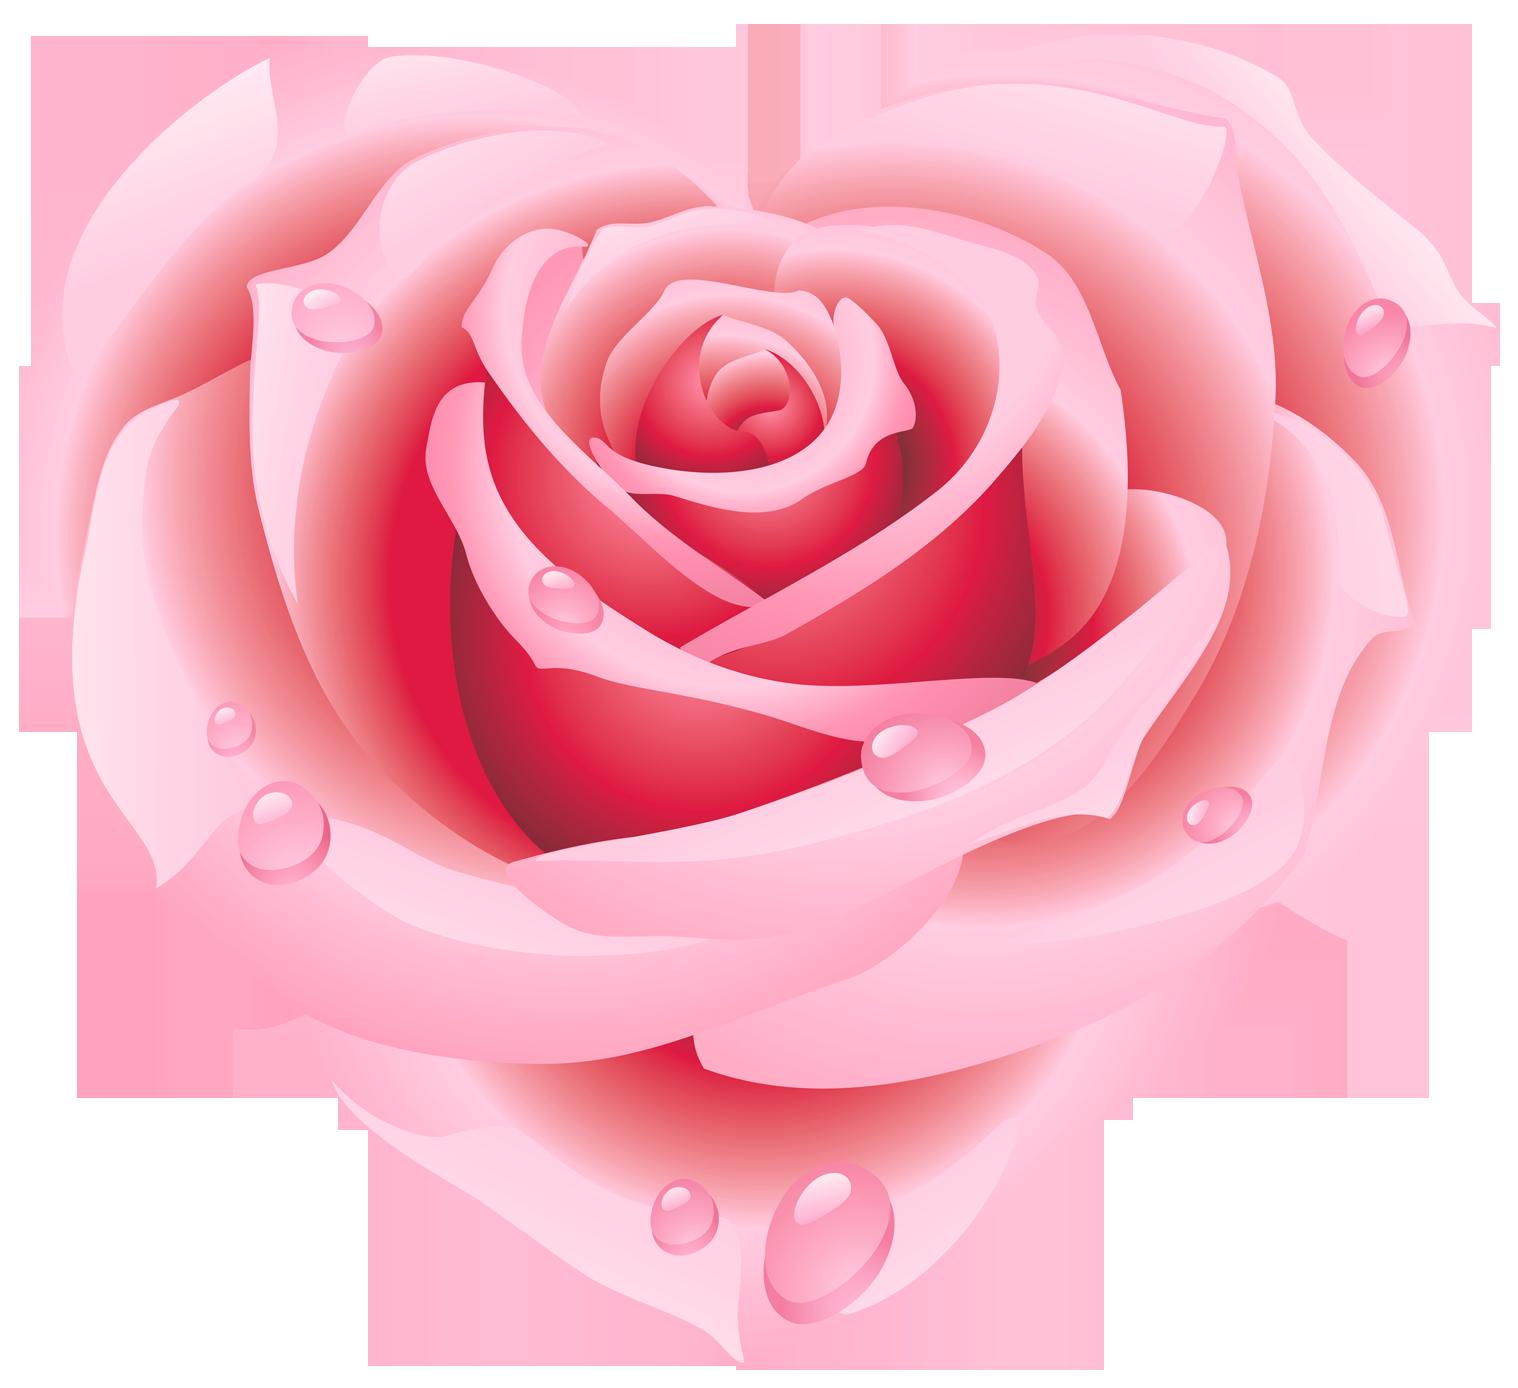 Rose heart . Hearts clipart garden